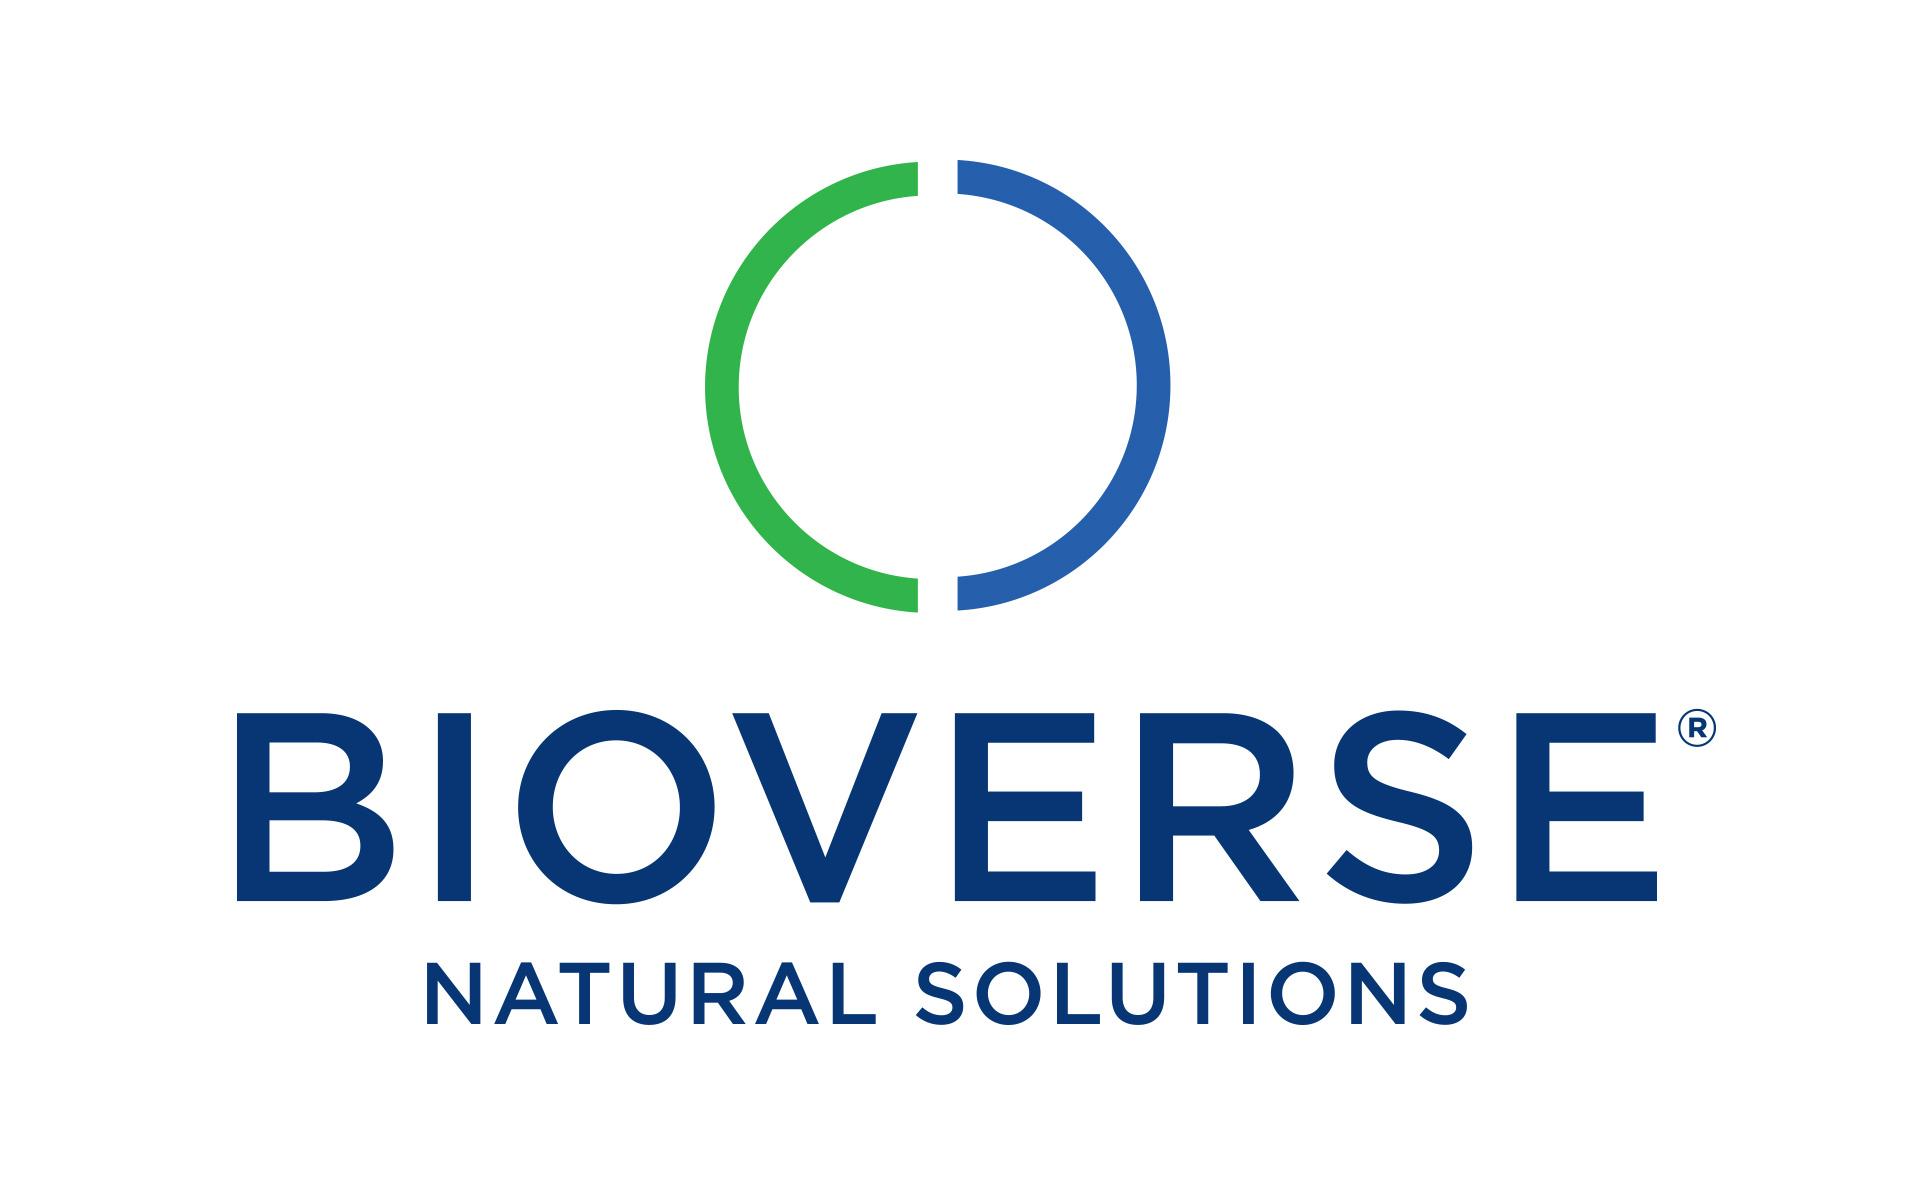 Bioverse